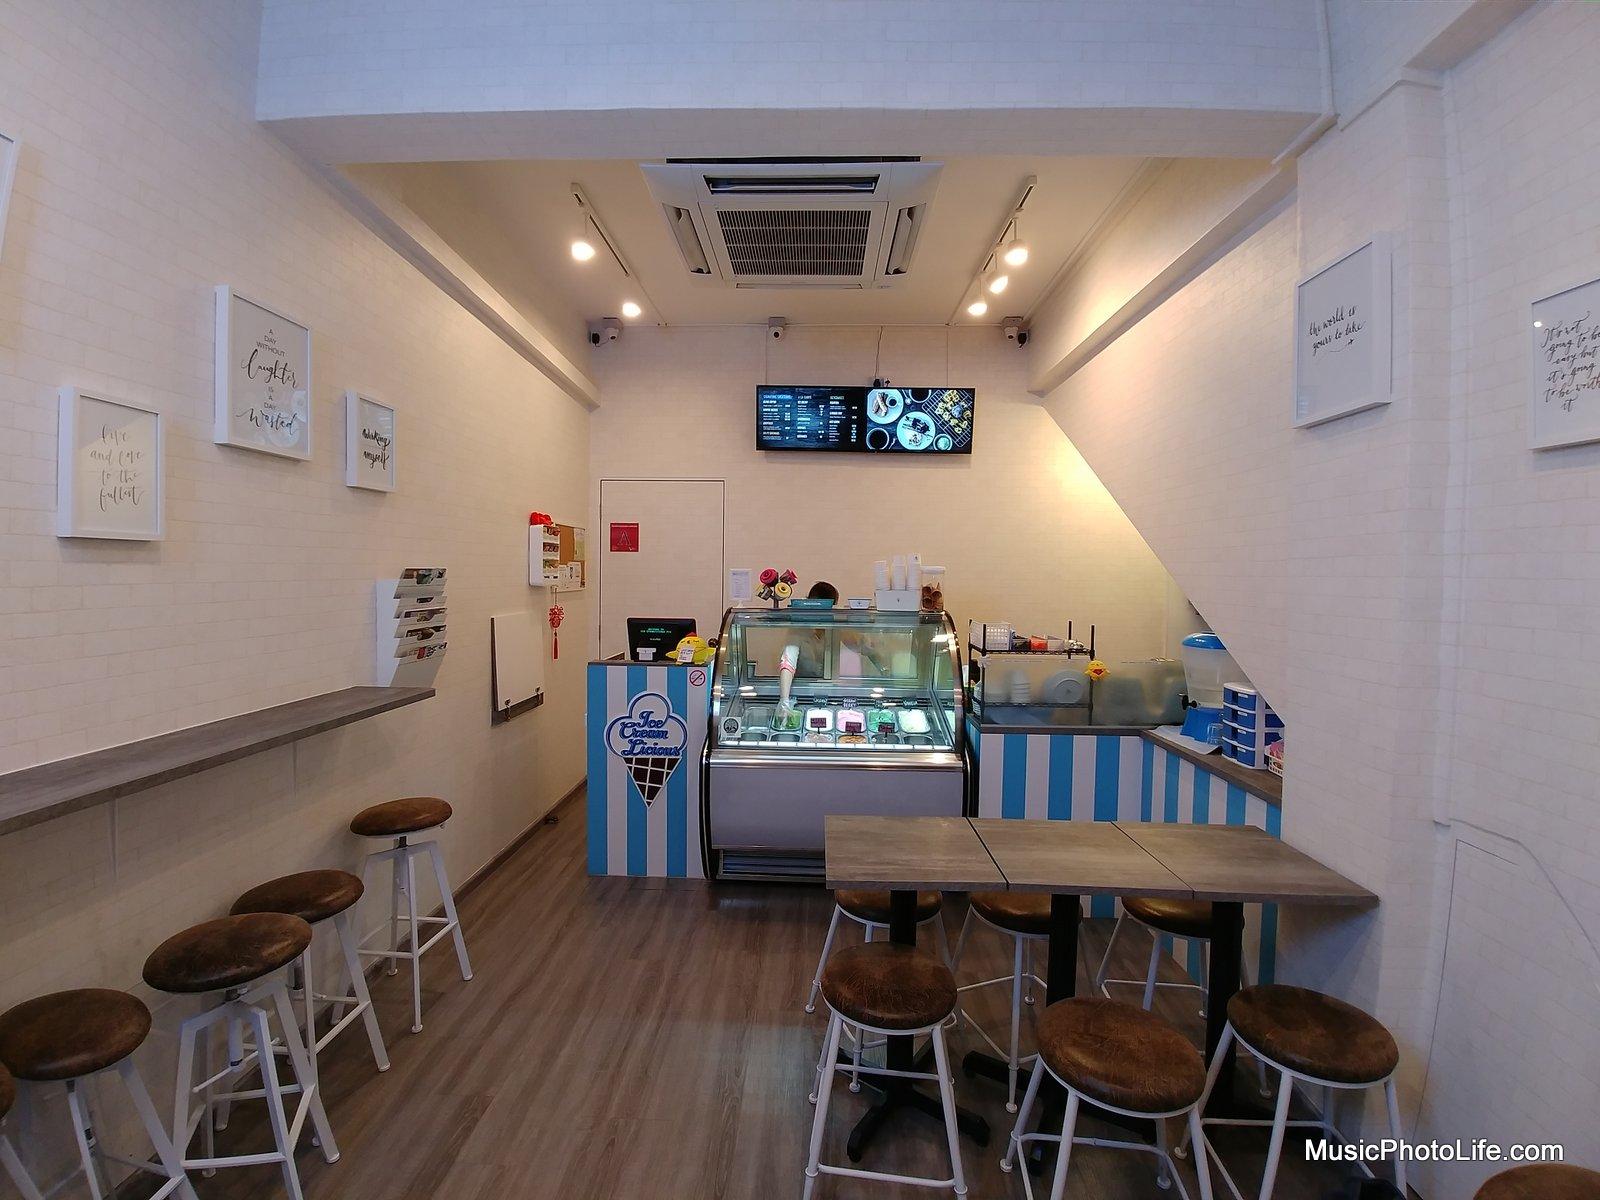 LG G6 wide angle photo at Ice Creamlicious